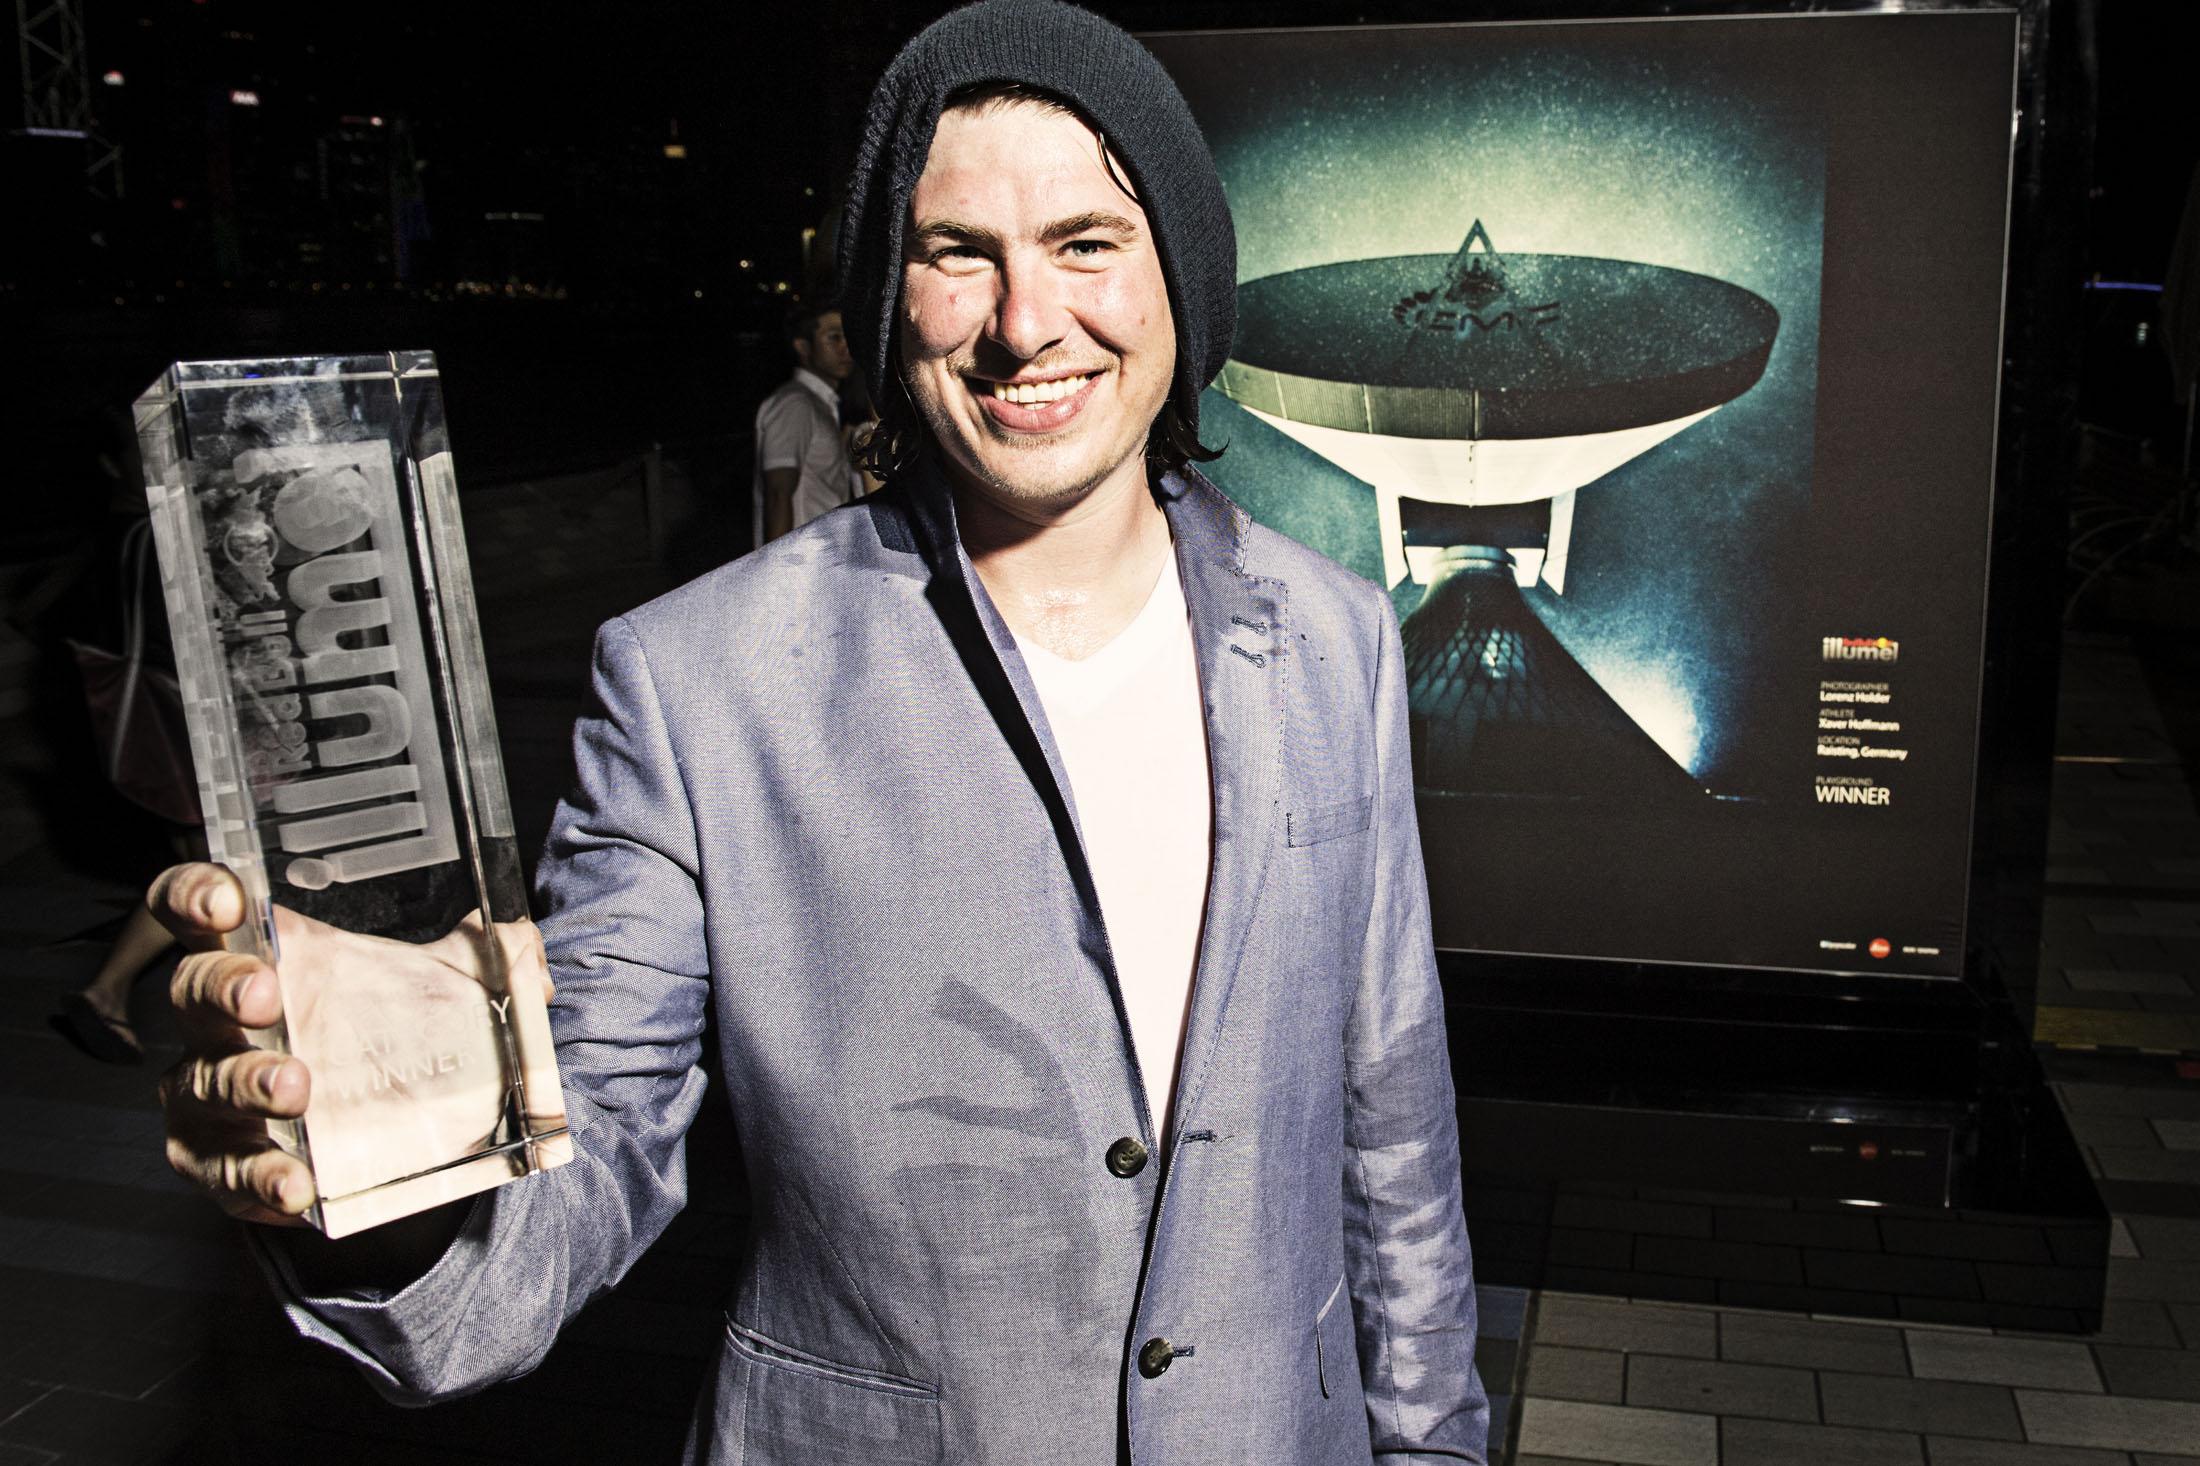 Lorenz Holder - 2013 Red Bull Illume Photo Contest Overall Winner